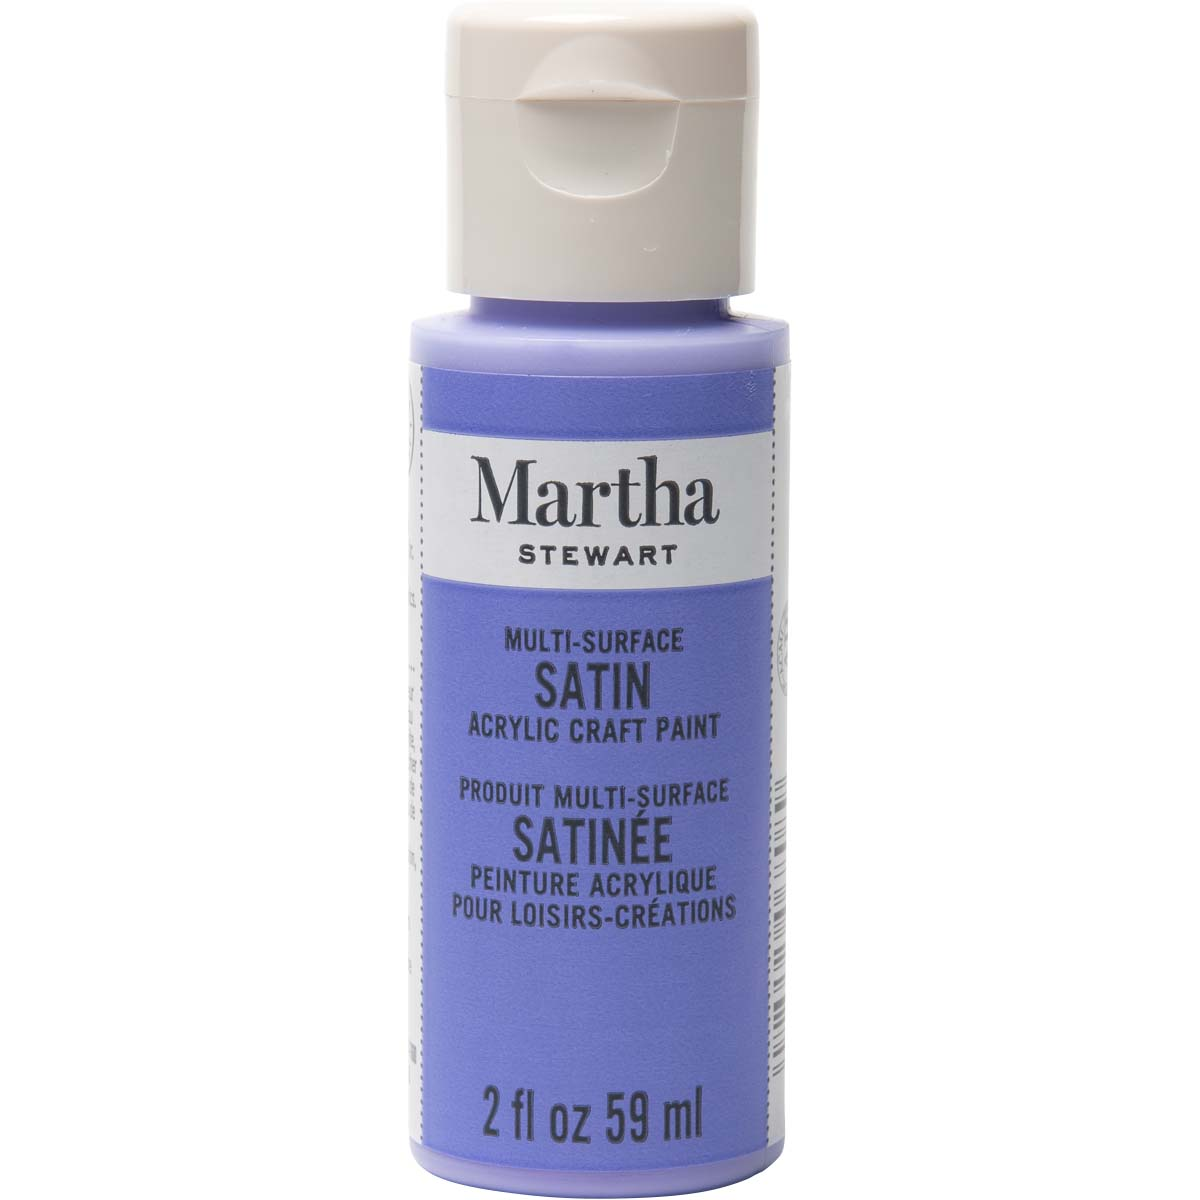 Martha Stewart® 2oz Multi-Surface Satin Acrylic Craft Paint - Periwinkle